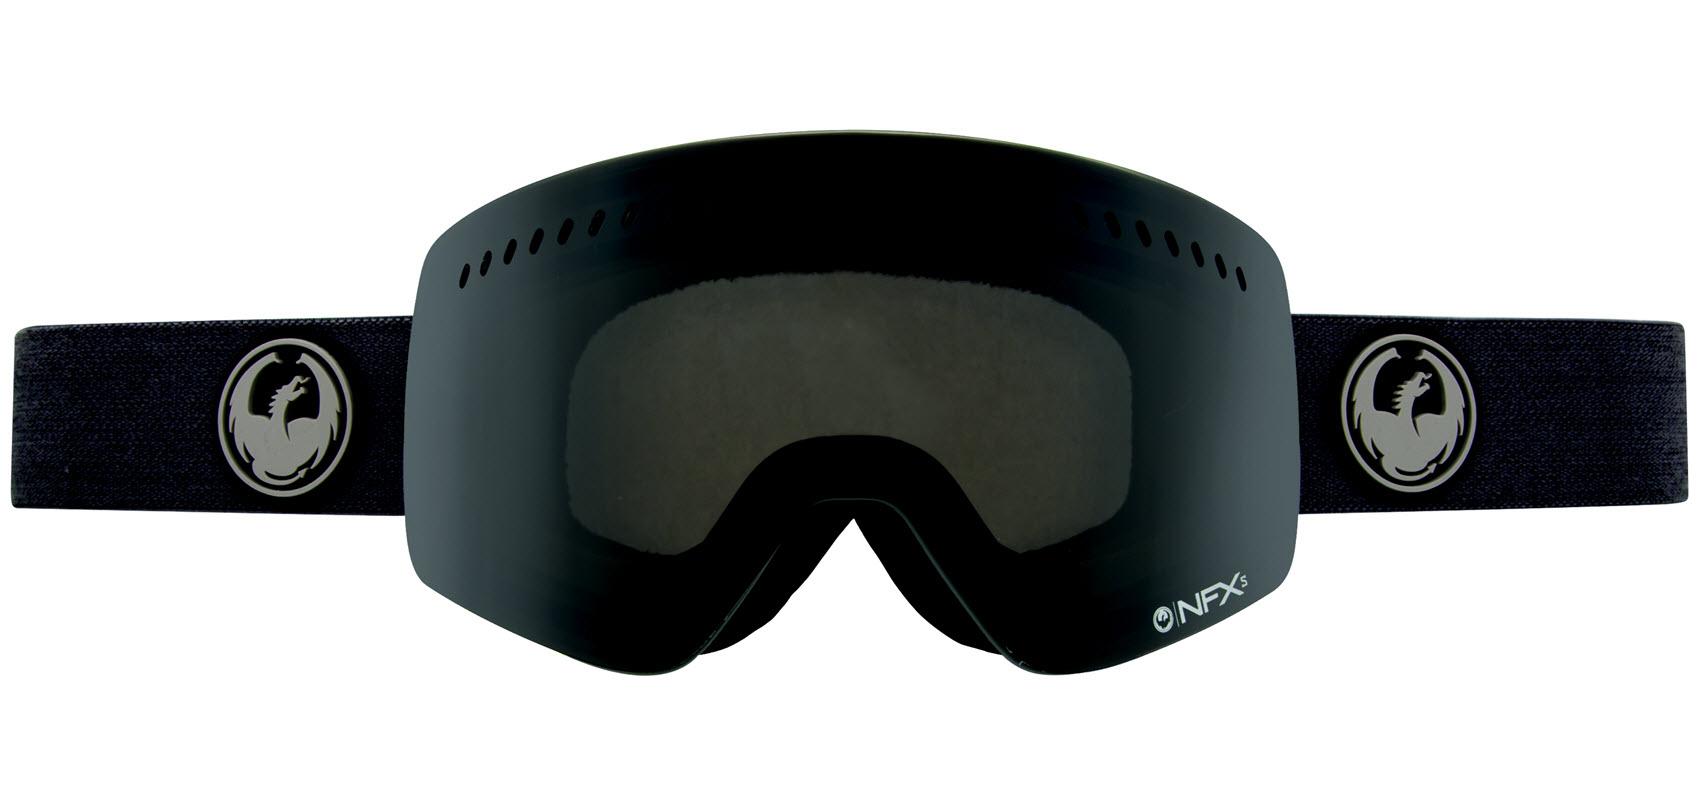 best ski goggles 2015  Dragon NFXS Snowboard Ski Goggles 2015 Ex Display Various Colurs ...